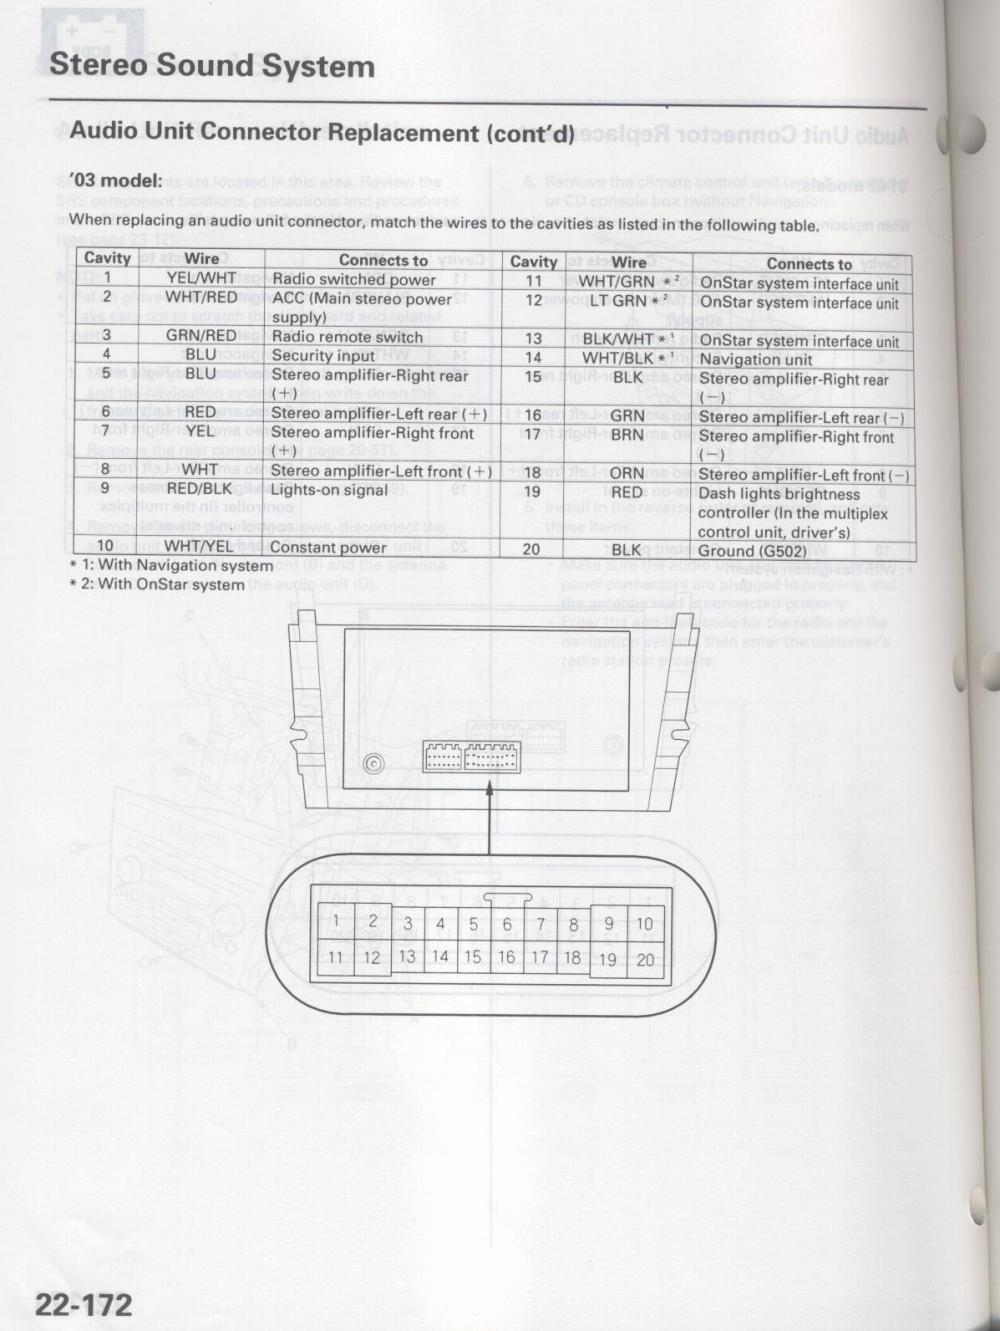 2000 Acura Rl Radio Wiring Diagram 1996 Toyota Corolla Side Kick Panel Fuse Box Diagram Source Auto4 Kdx 200 Jeanjaures37 Fr